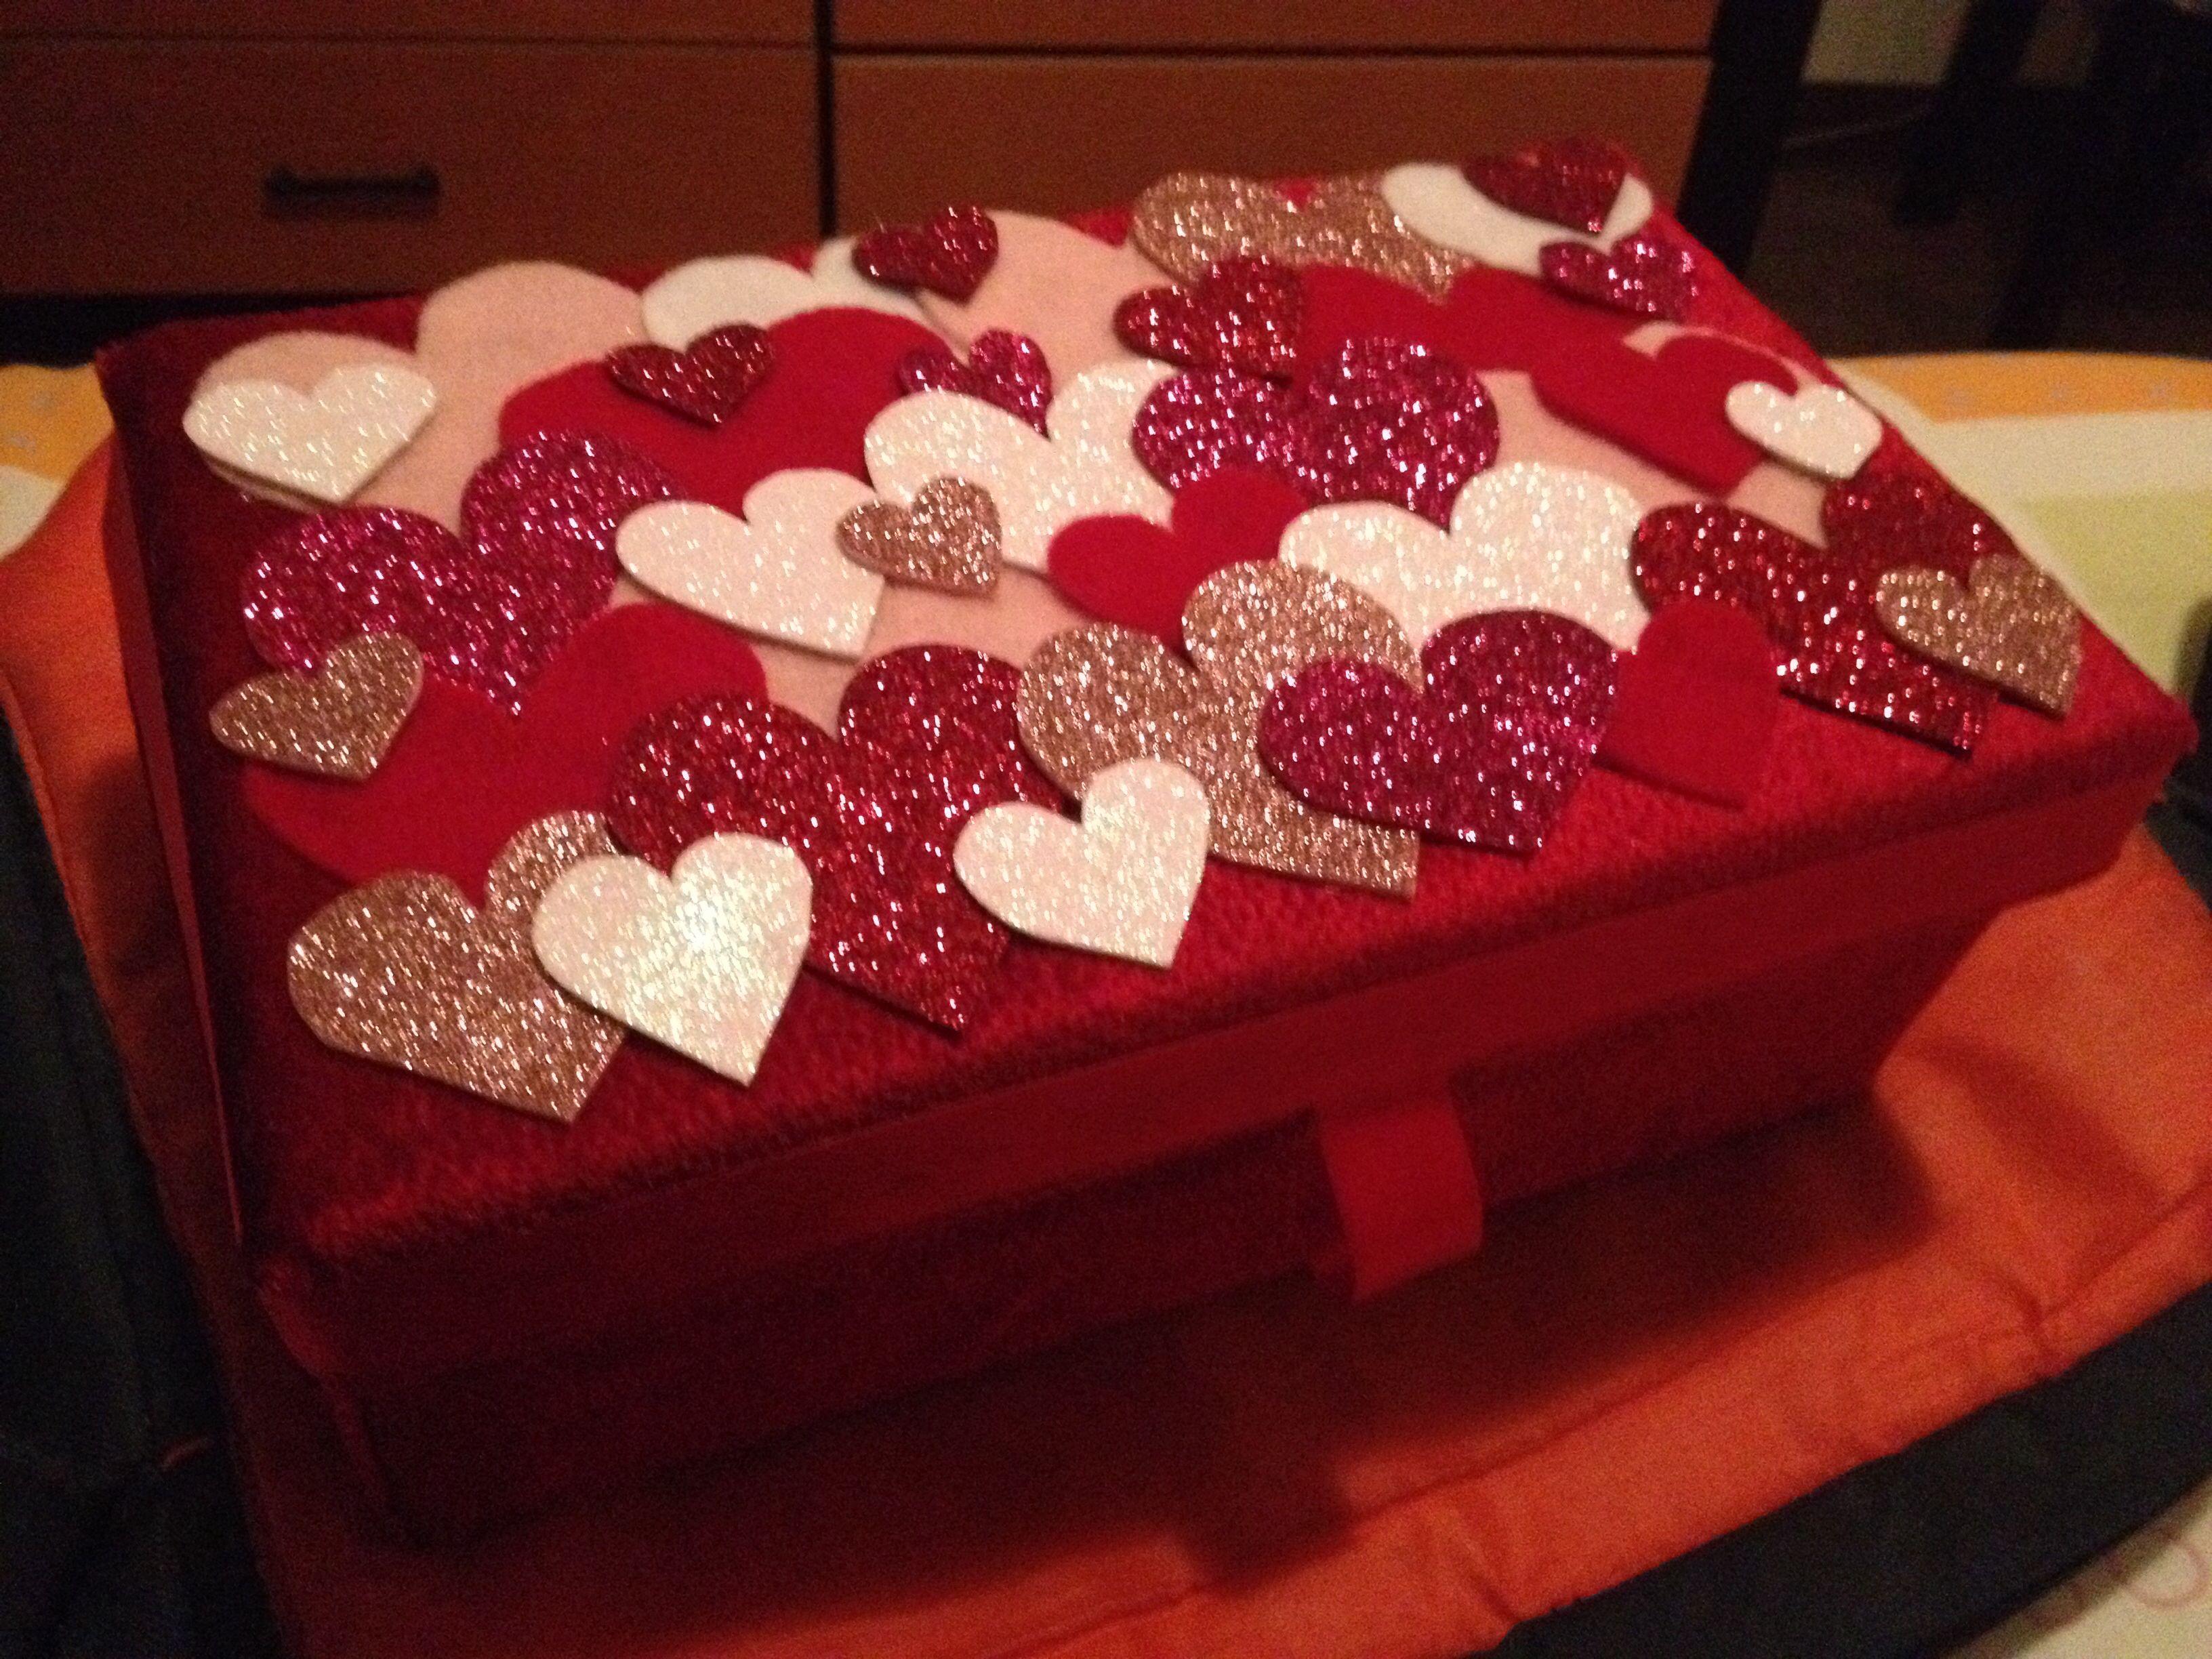 Caja de zapatos decorada con tela caja de zapatos - Decorar cajas de zapatos ...